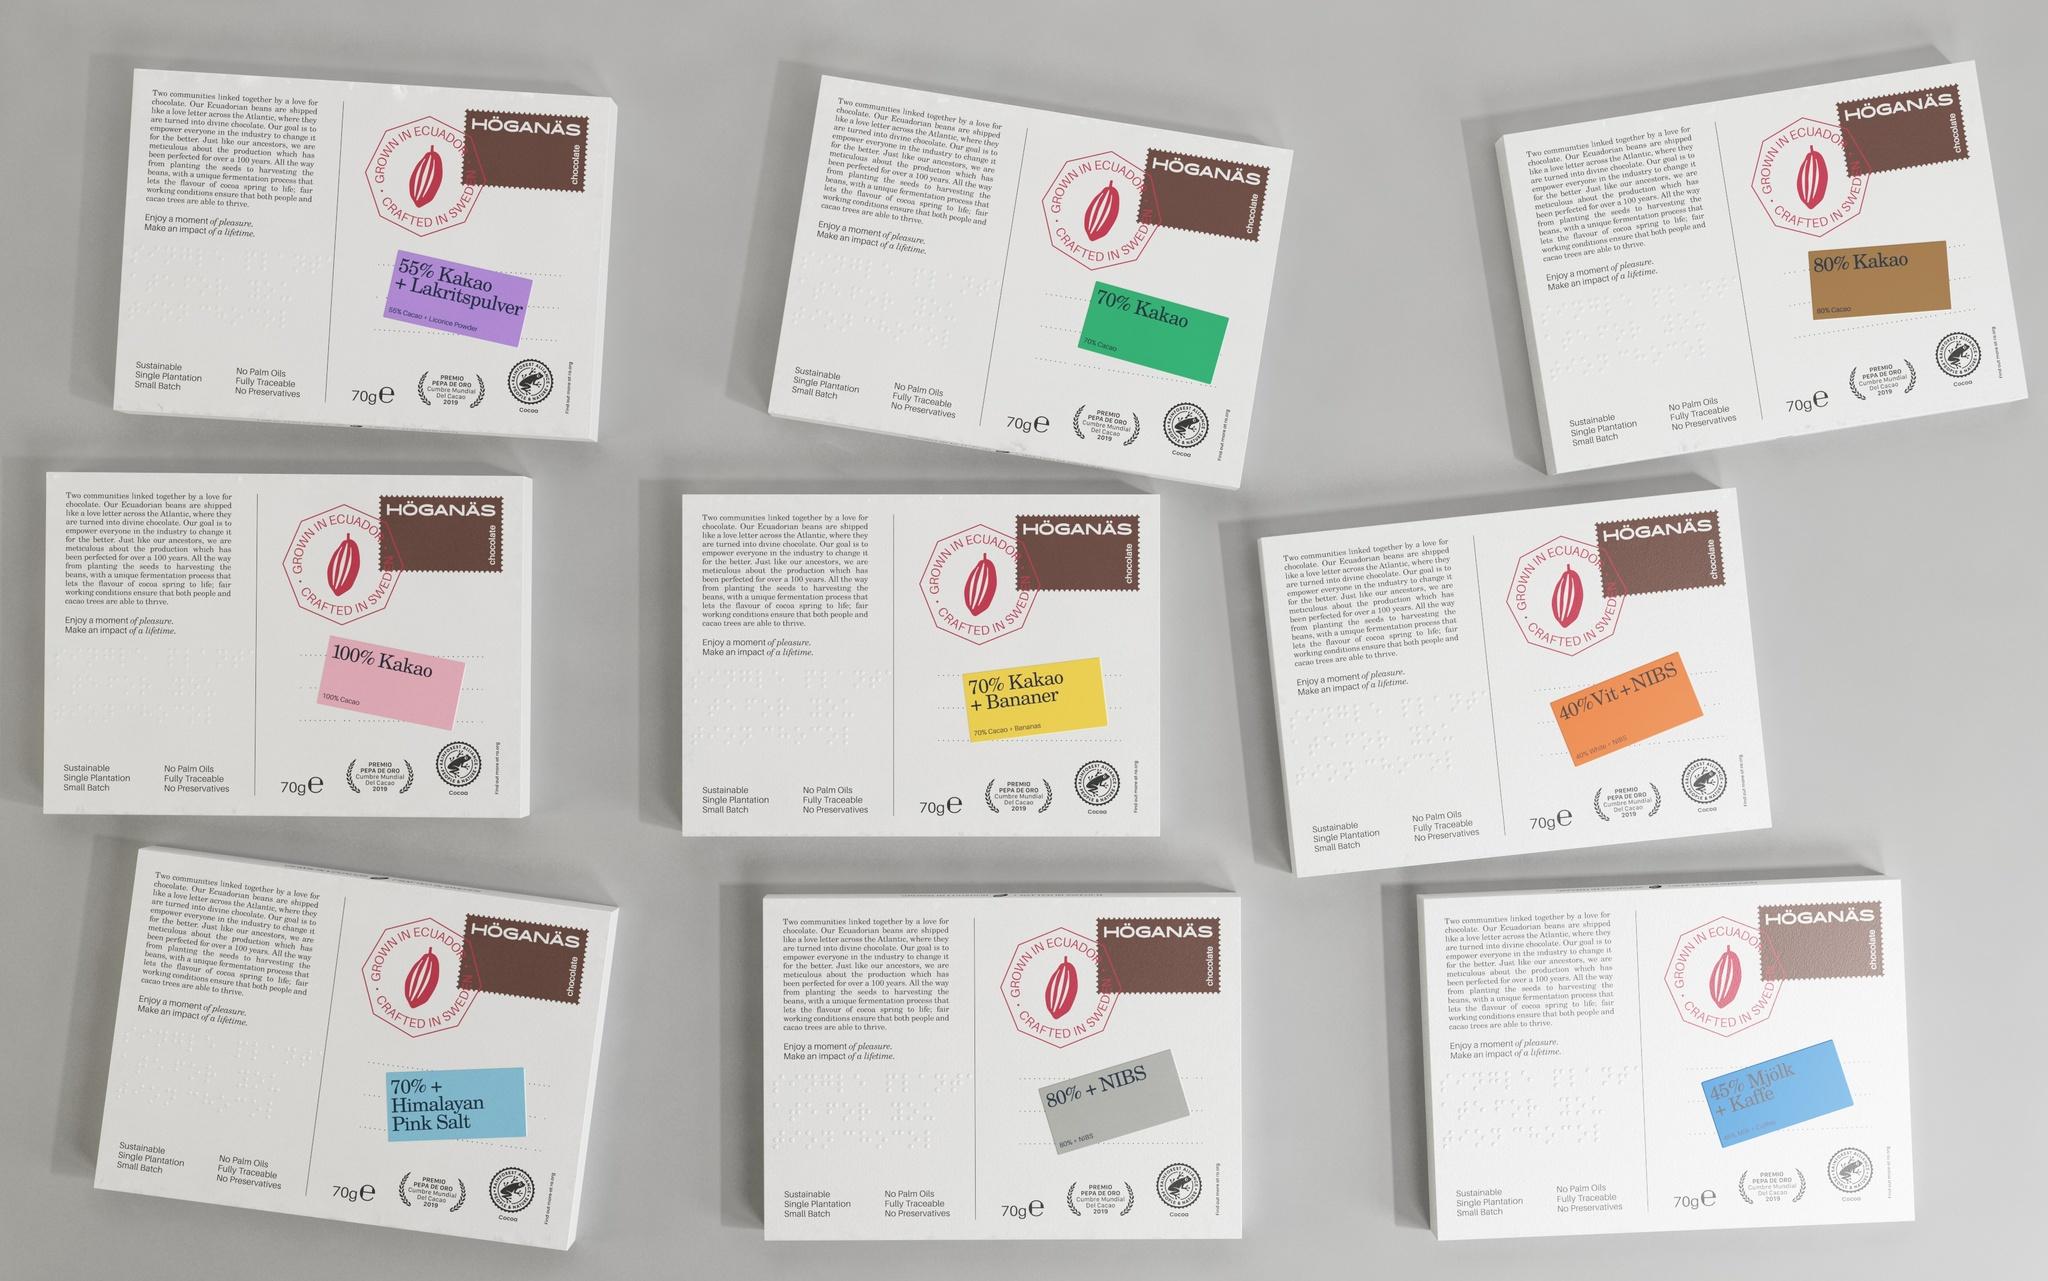 80% Kakao Höganäs Chocolate Kakor 70g